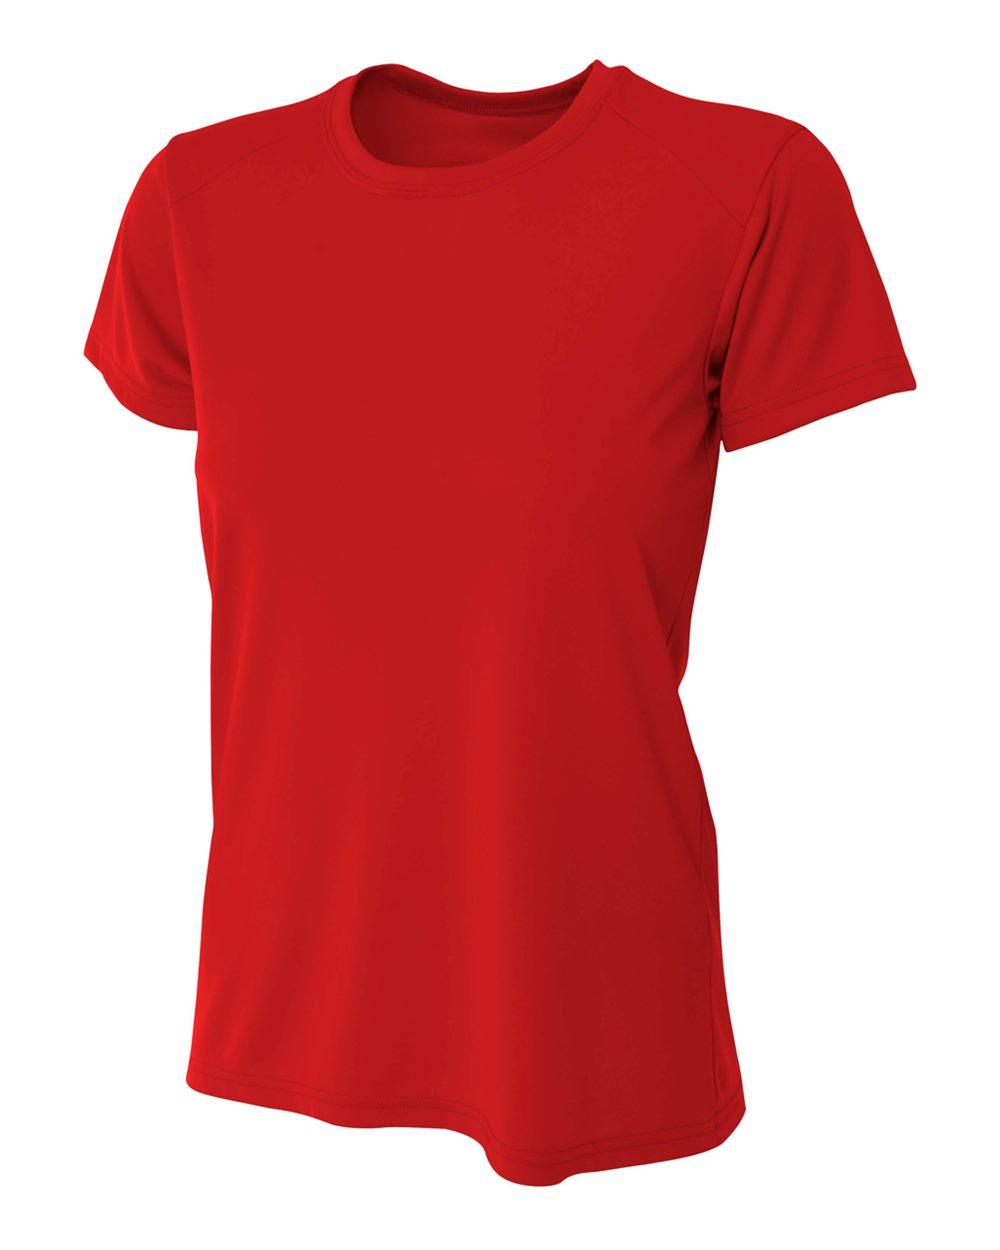 womens-polo-mwicking-red.jpg